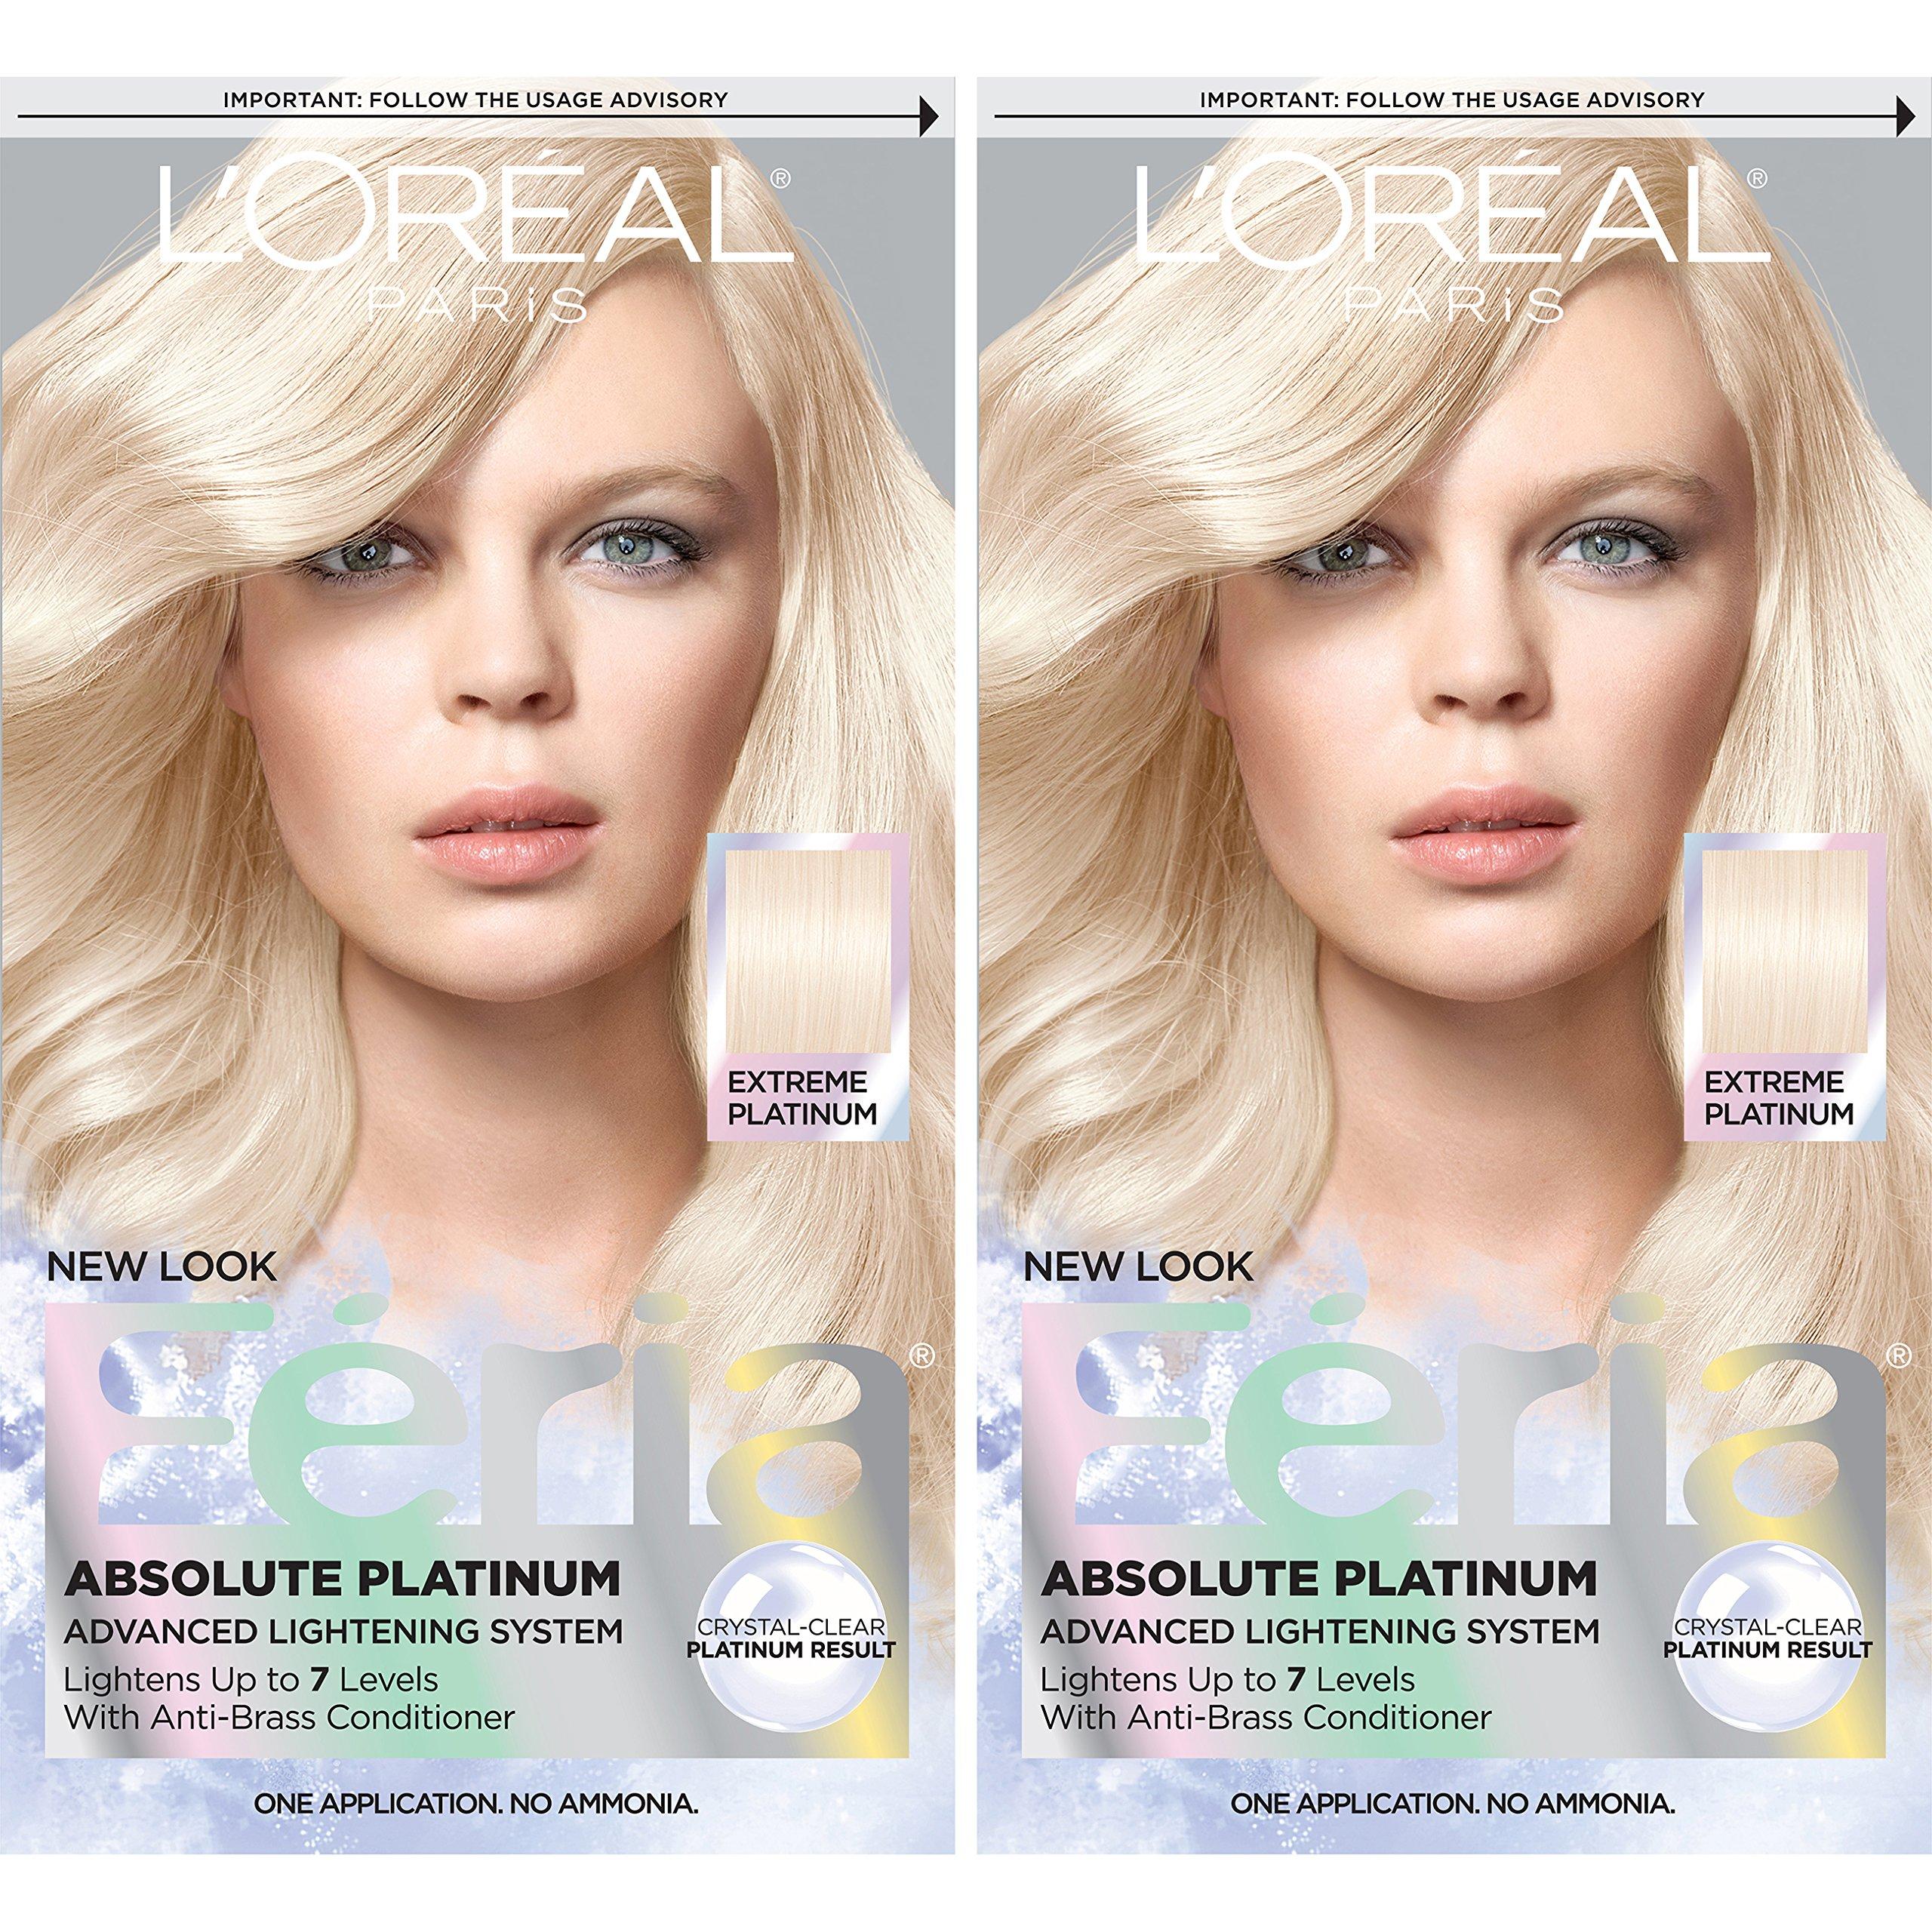 L'Oreal Paris Feria Permanent Hair Color, Extreme Platinum, 2 Count